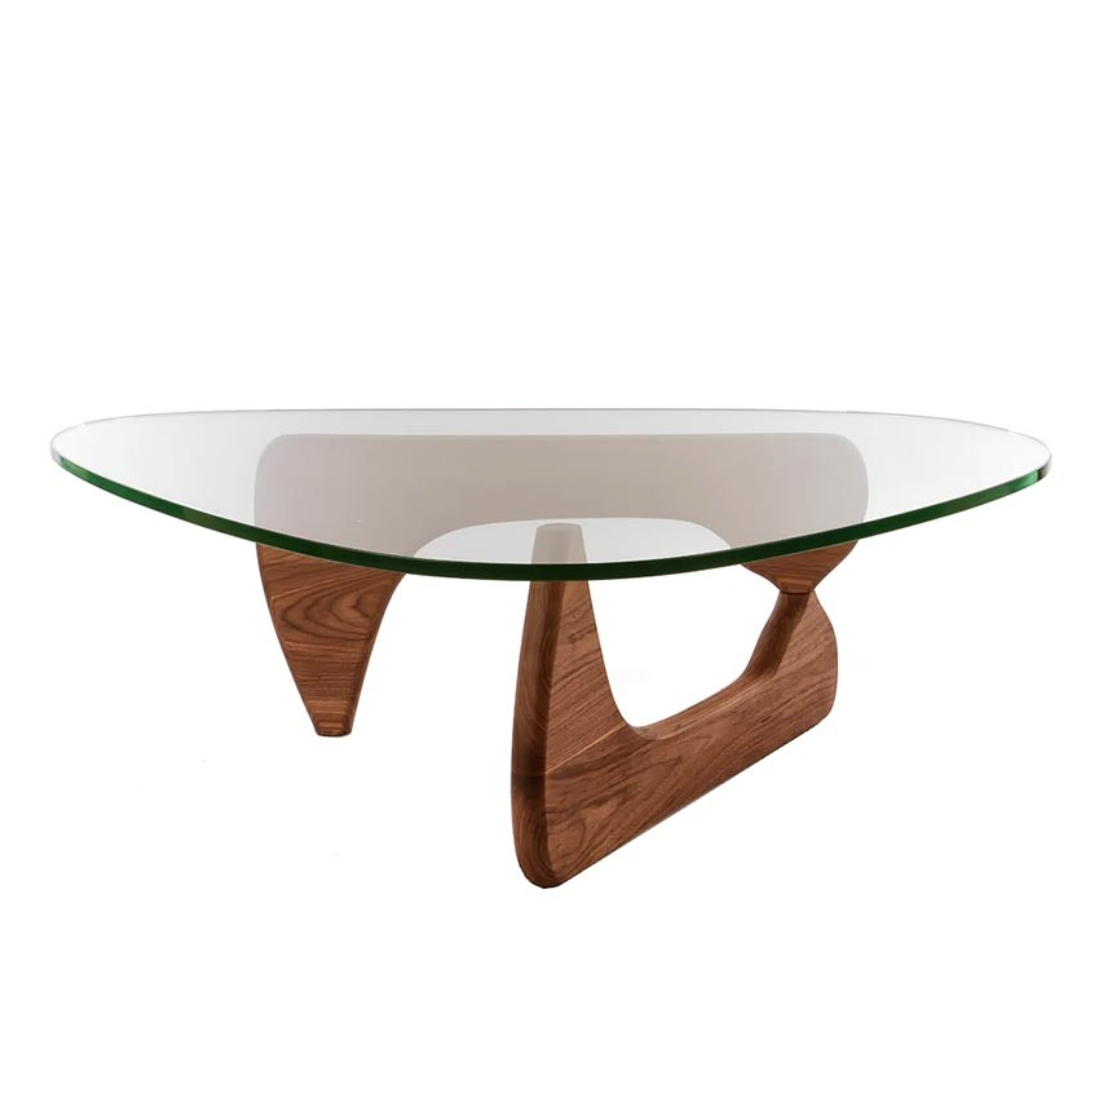 Noguchi Coffee Table Mikaza Meubles Modernes Montreal Modern Furniture Ottawa Noguchi Coffee Table Coffee Table Solid Coffee Table [ 1120 x 1120 Pixel ]